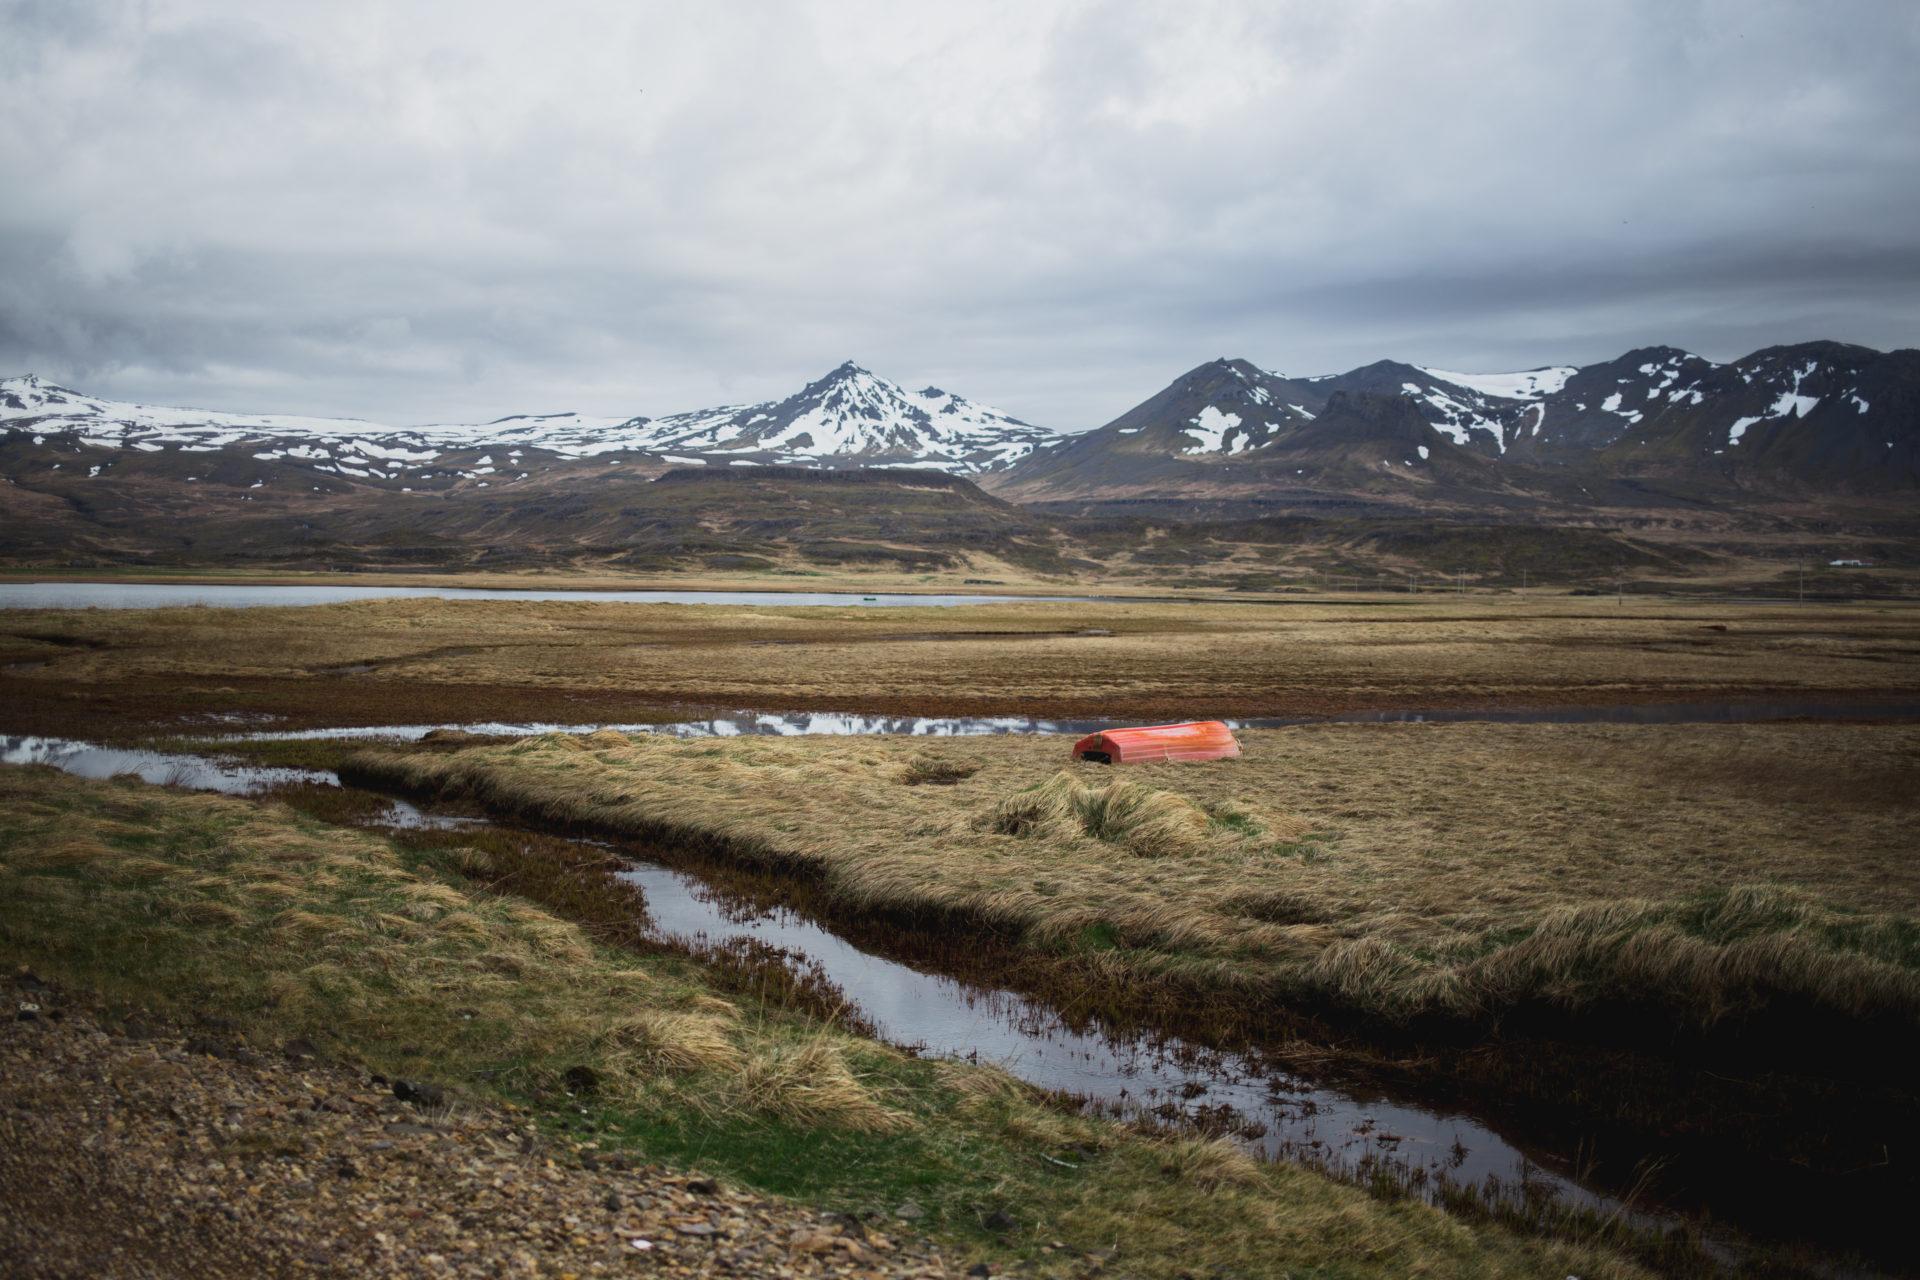 Island_Iceland_IMG_2655_Carolin-Weinkopf-2